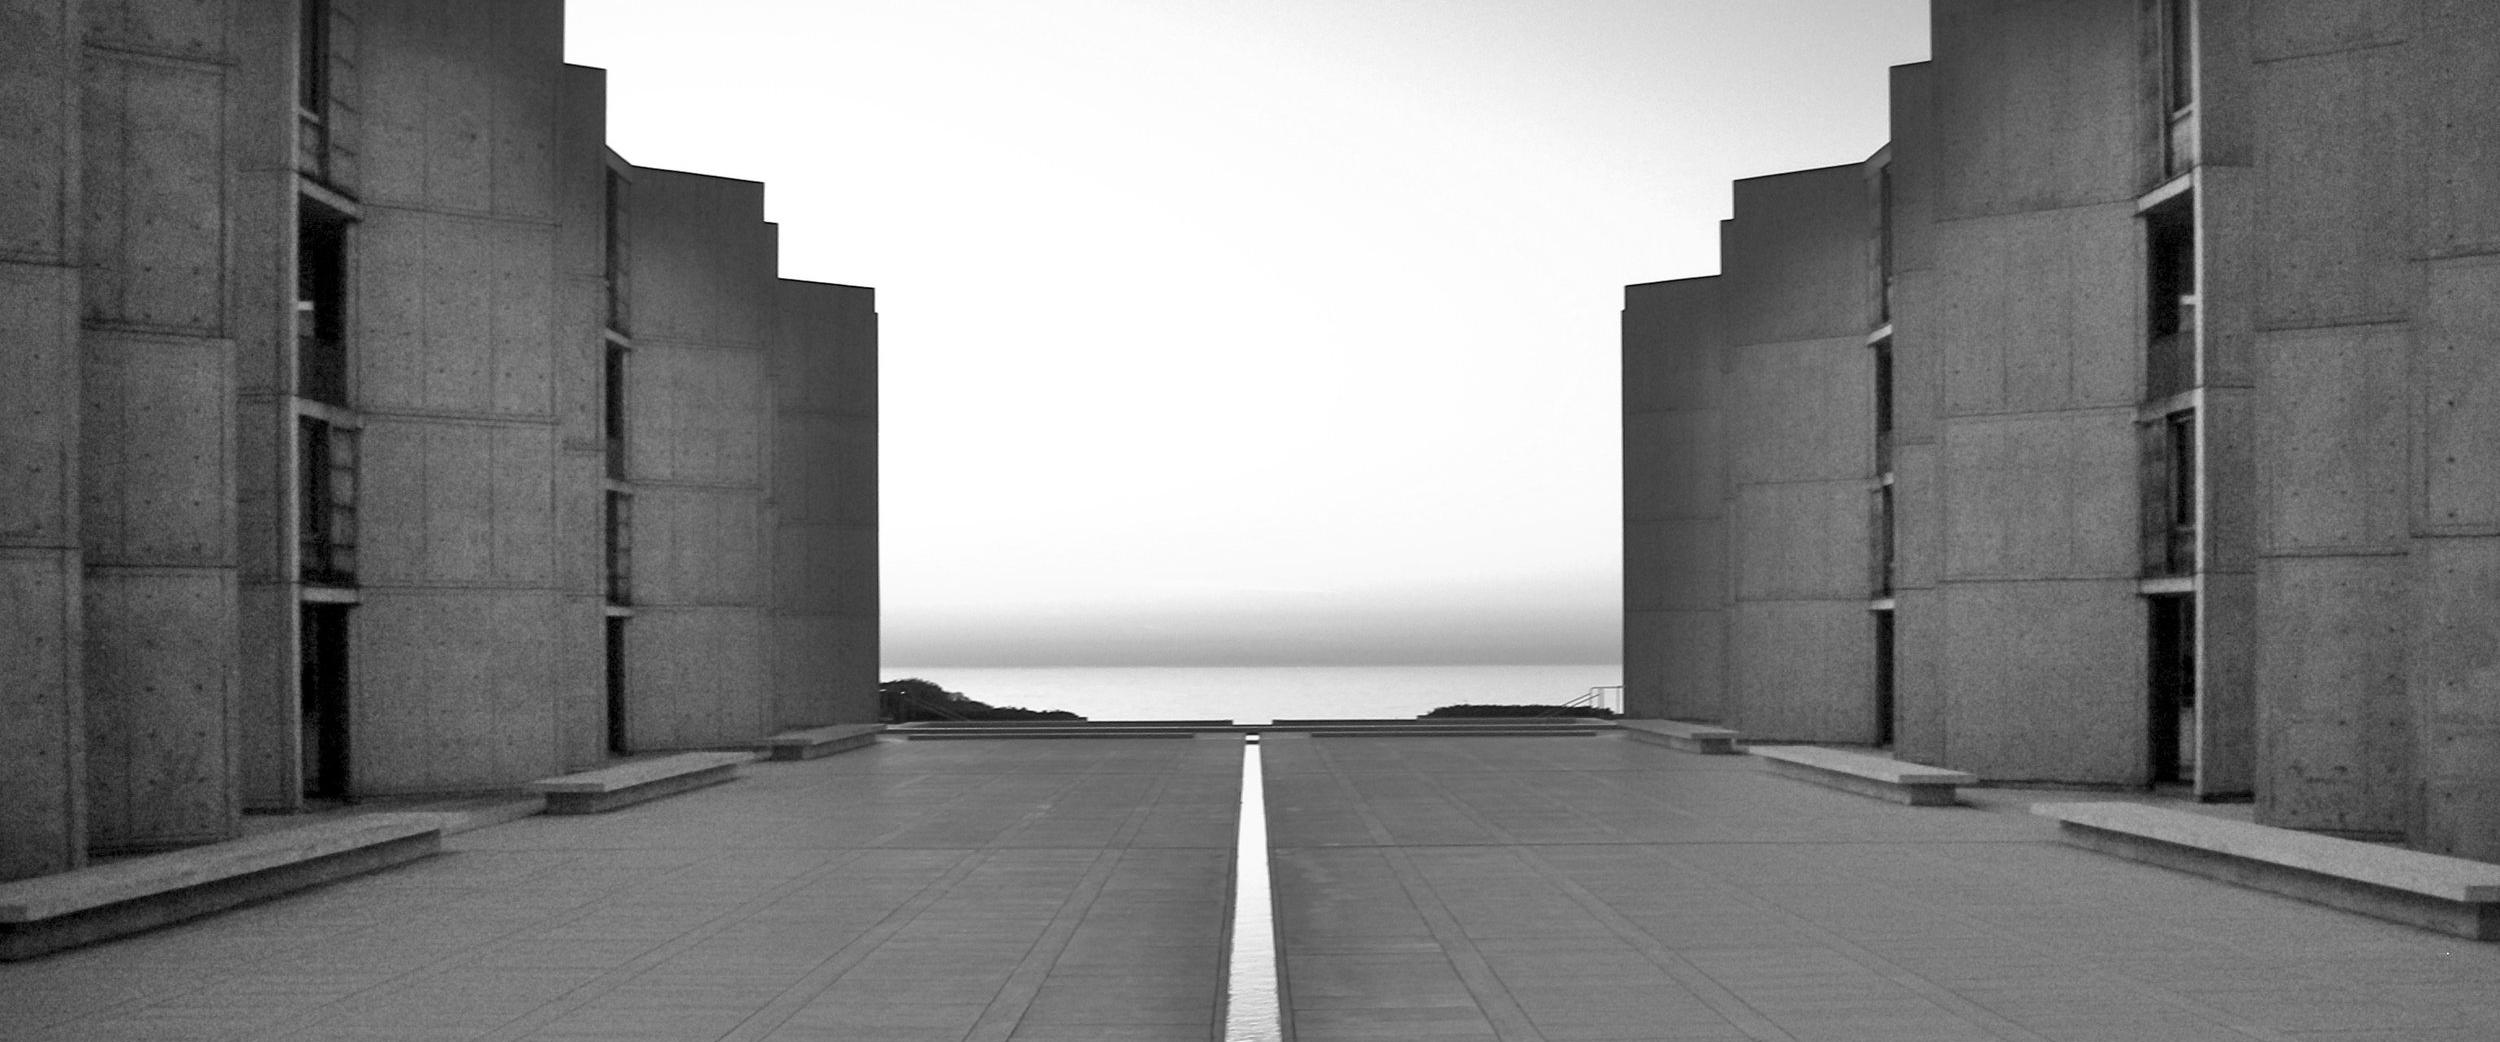 Salk_Institute.jpg